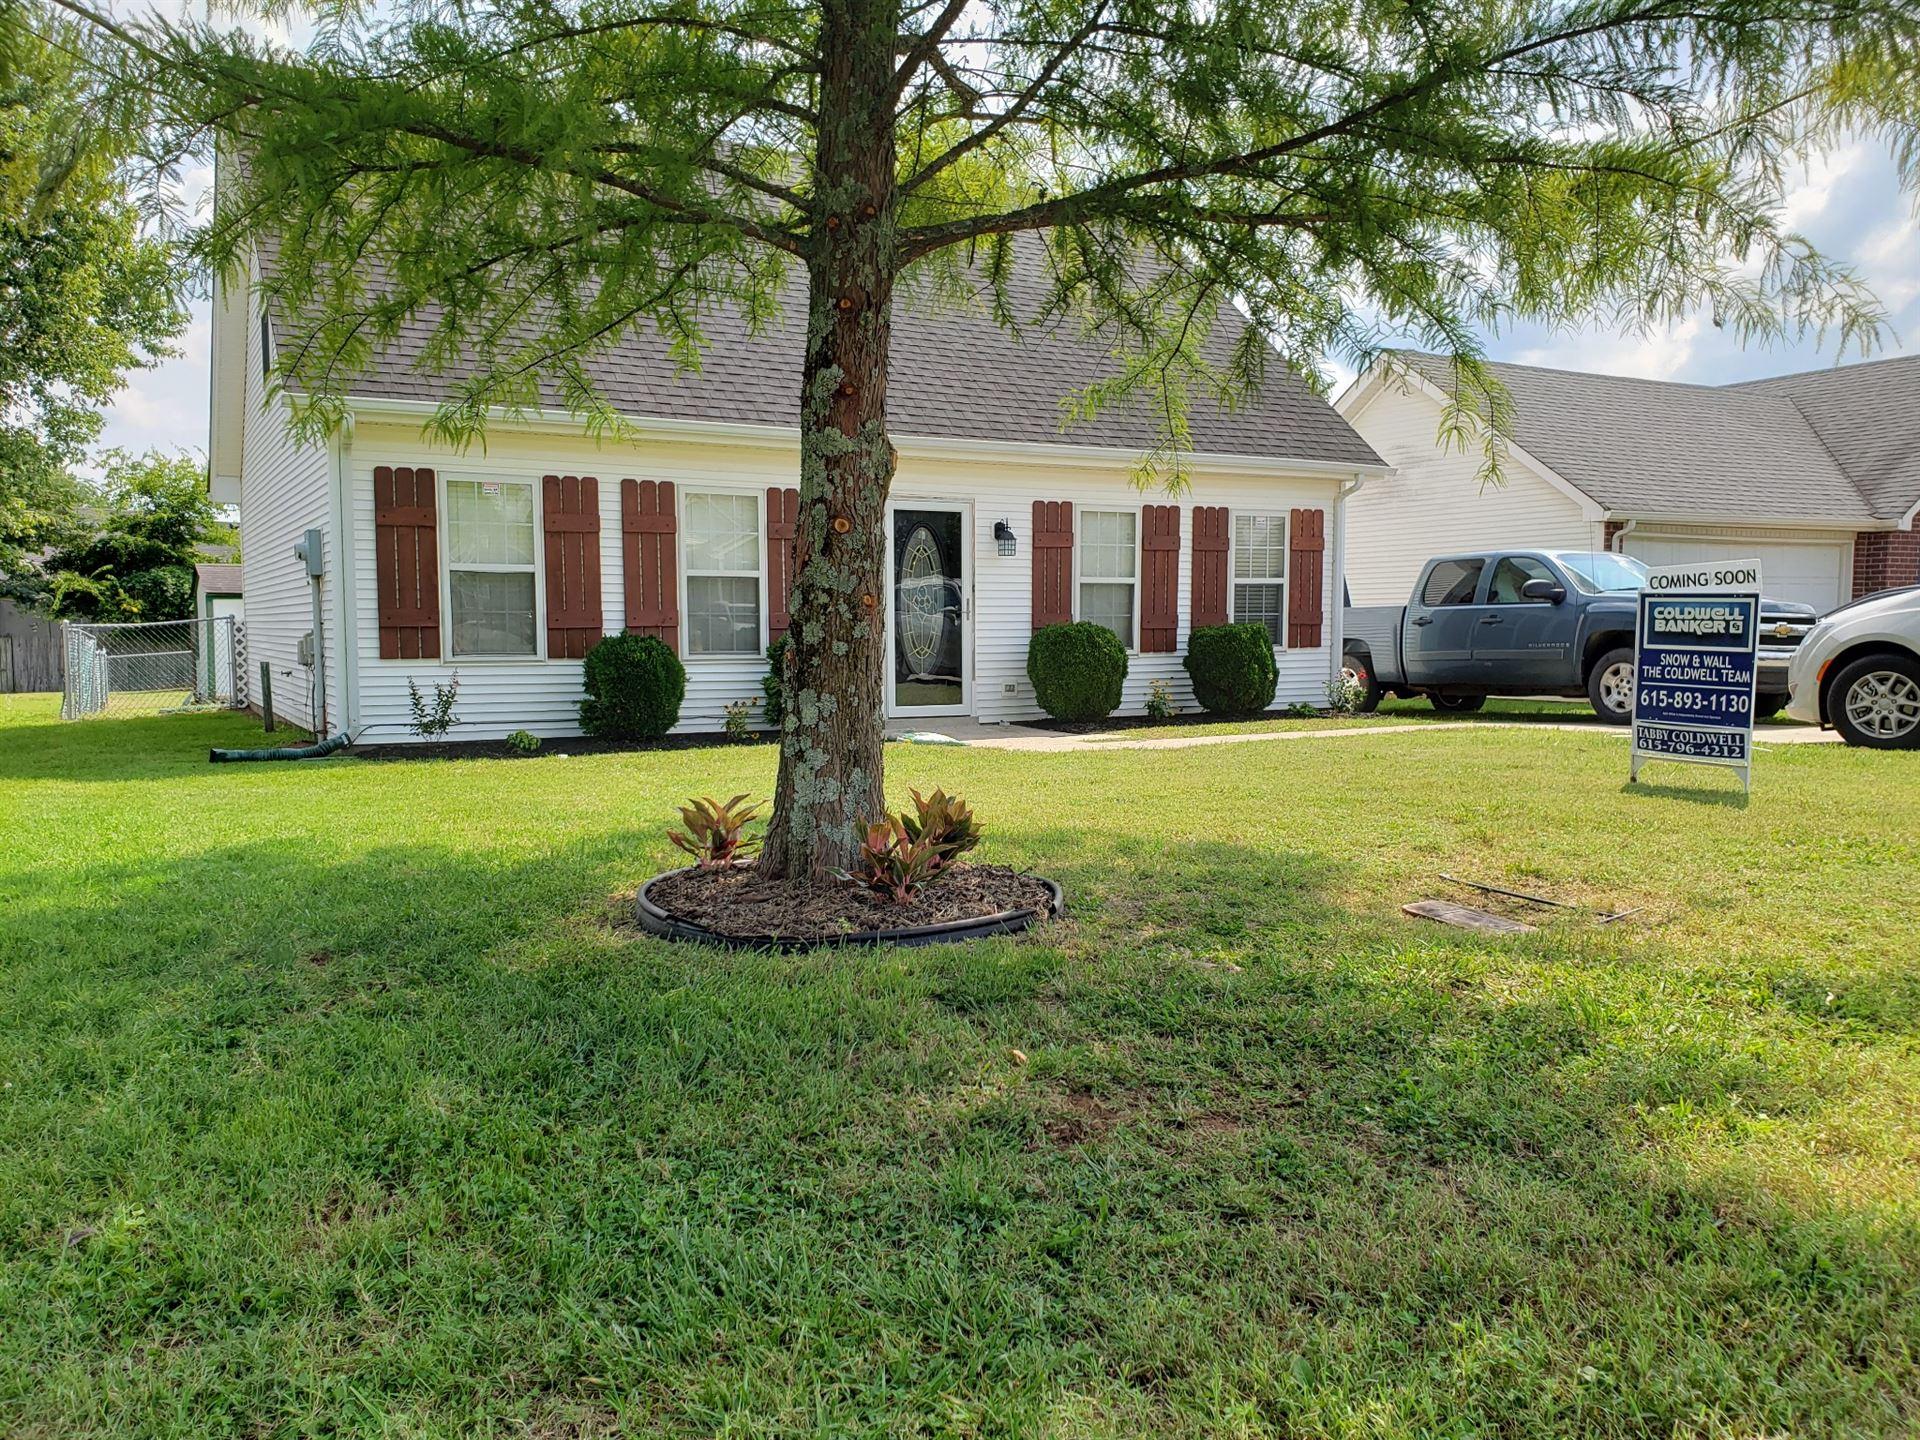 2733 Painted Pony Dr, Murfreesboro, TN 37128 - MLS#: 2187904